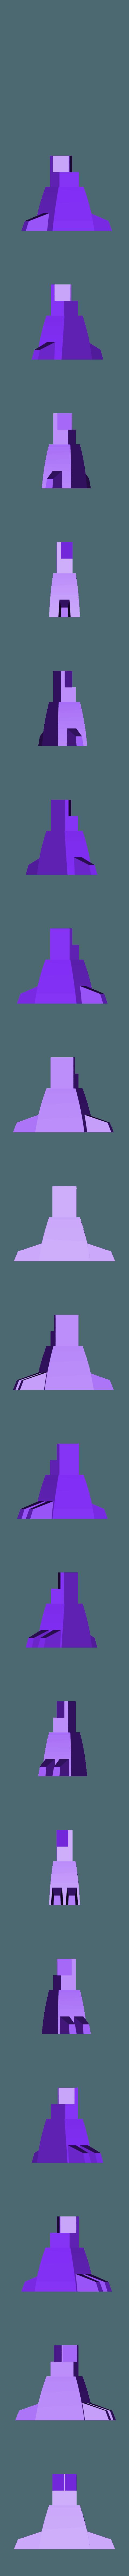 Feet-Right.STL Download STL file Grimlock • Model to 3D print, biglildesign